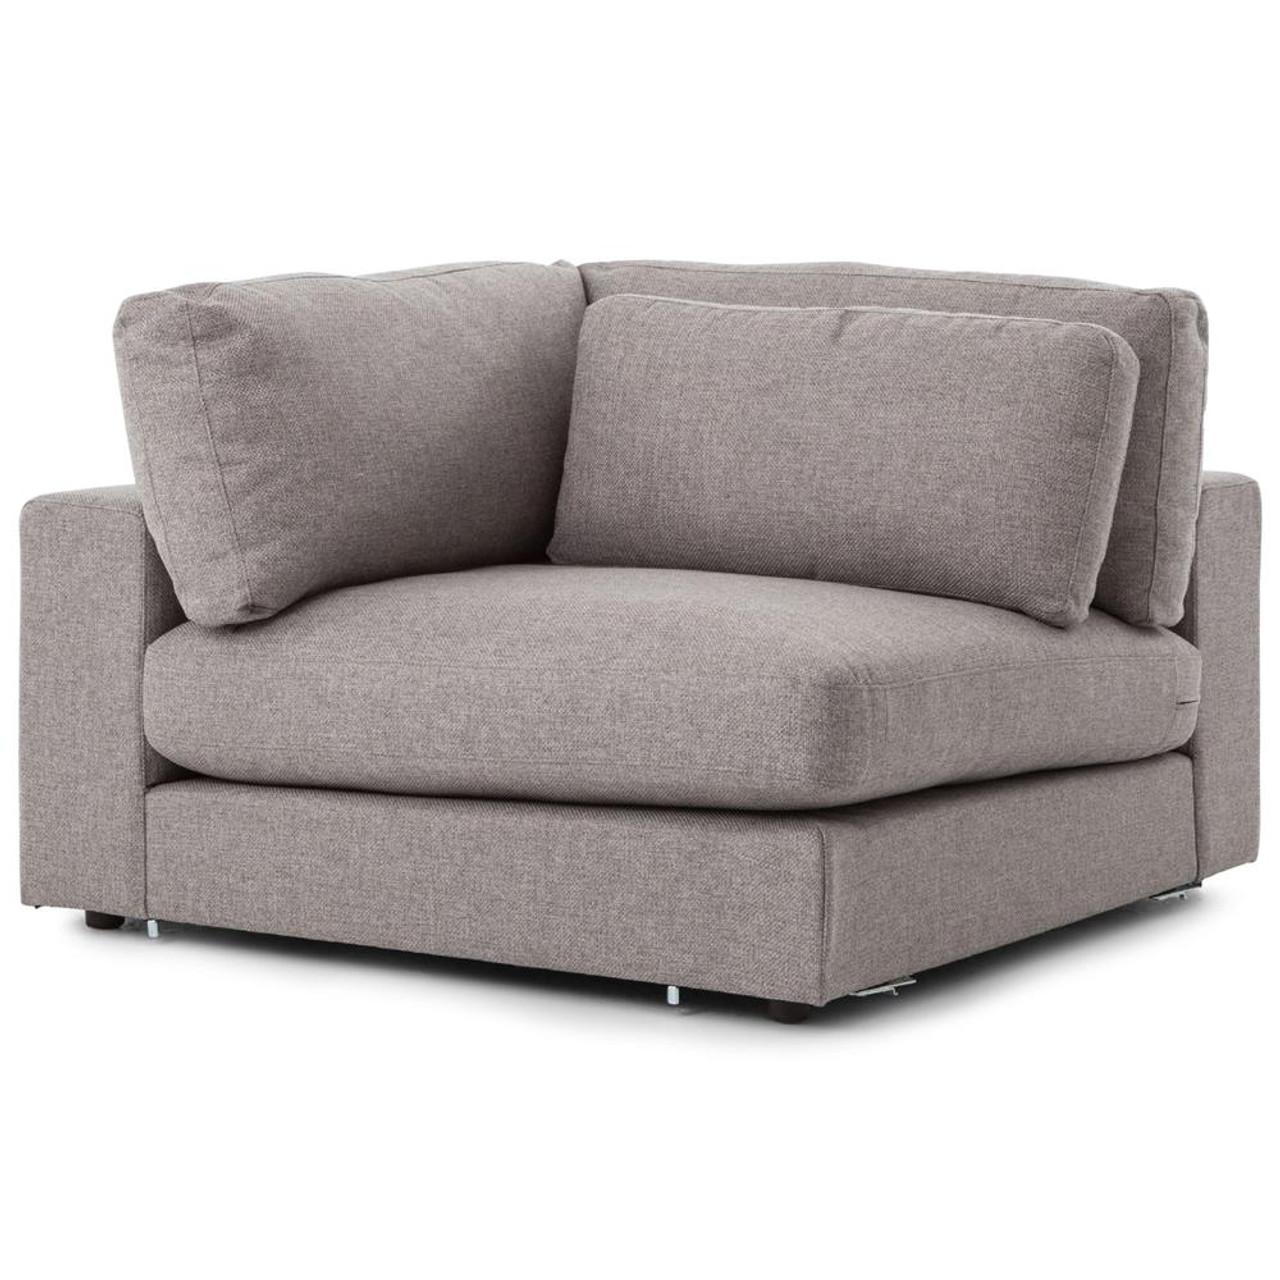 Attrayant Bloor Modern Gray Sectional Corner Piece